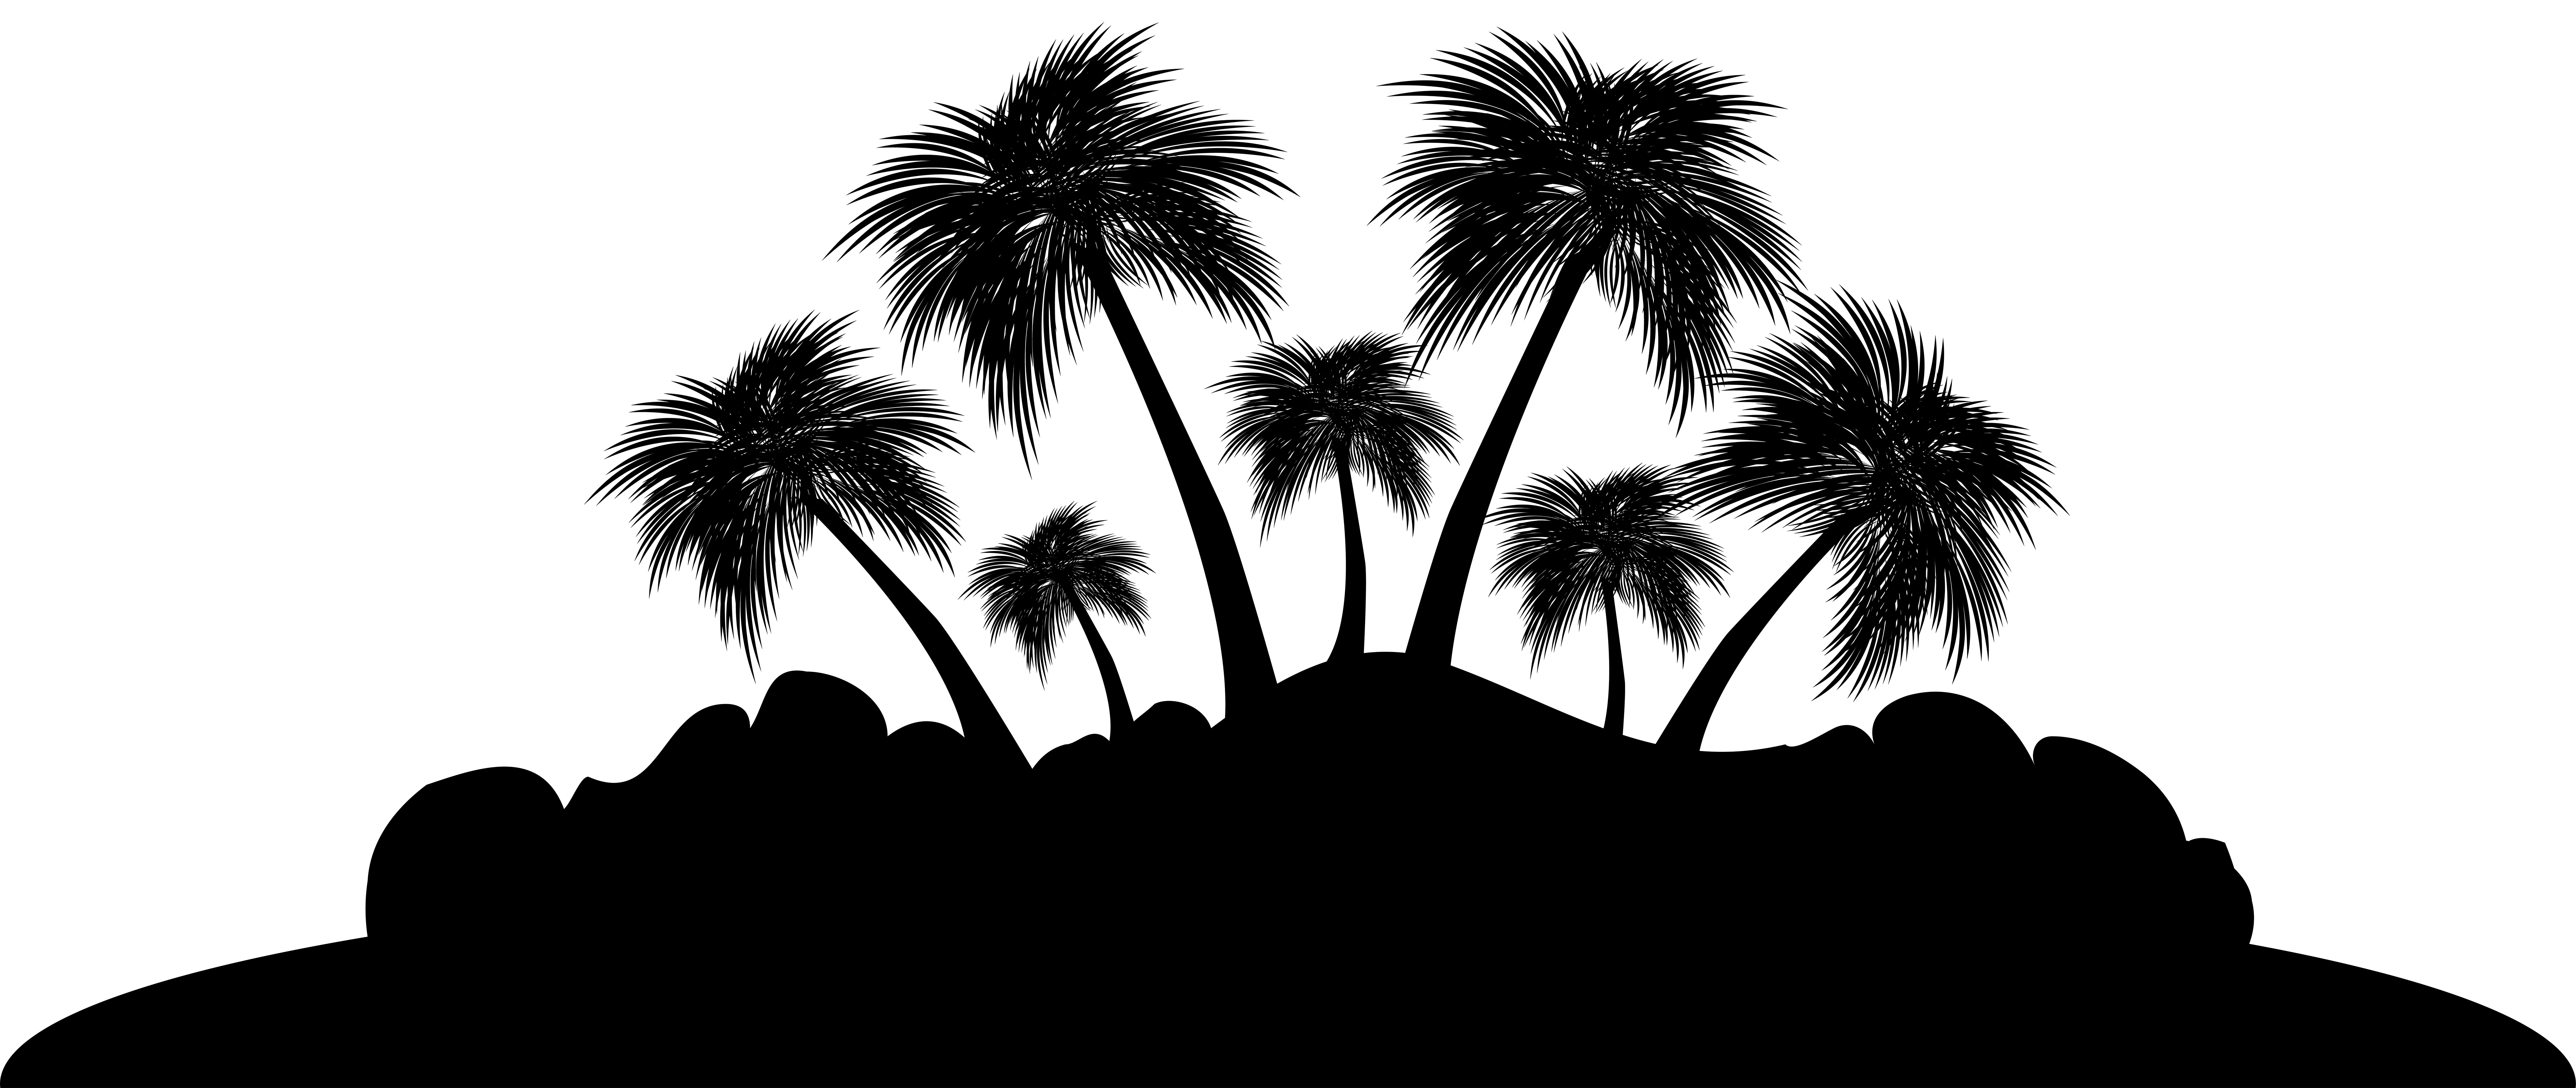 Island silhouette clip art clipart collection Cliparts